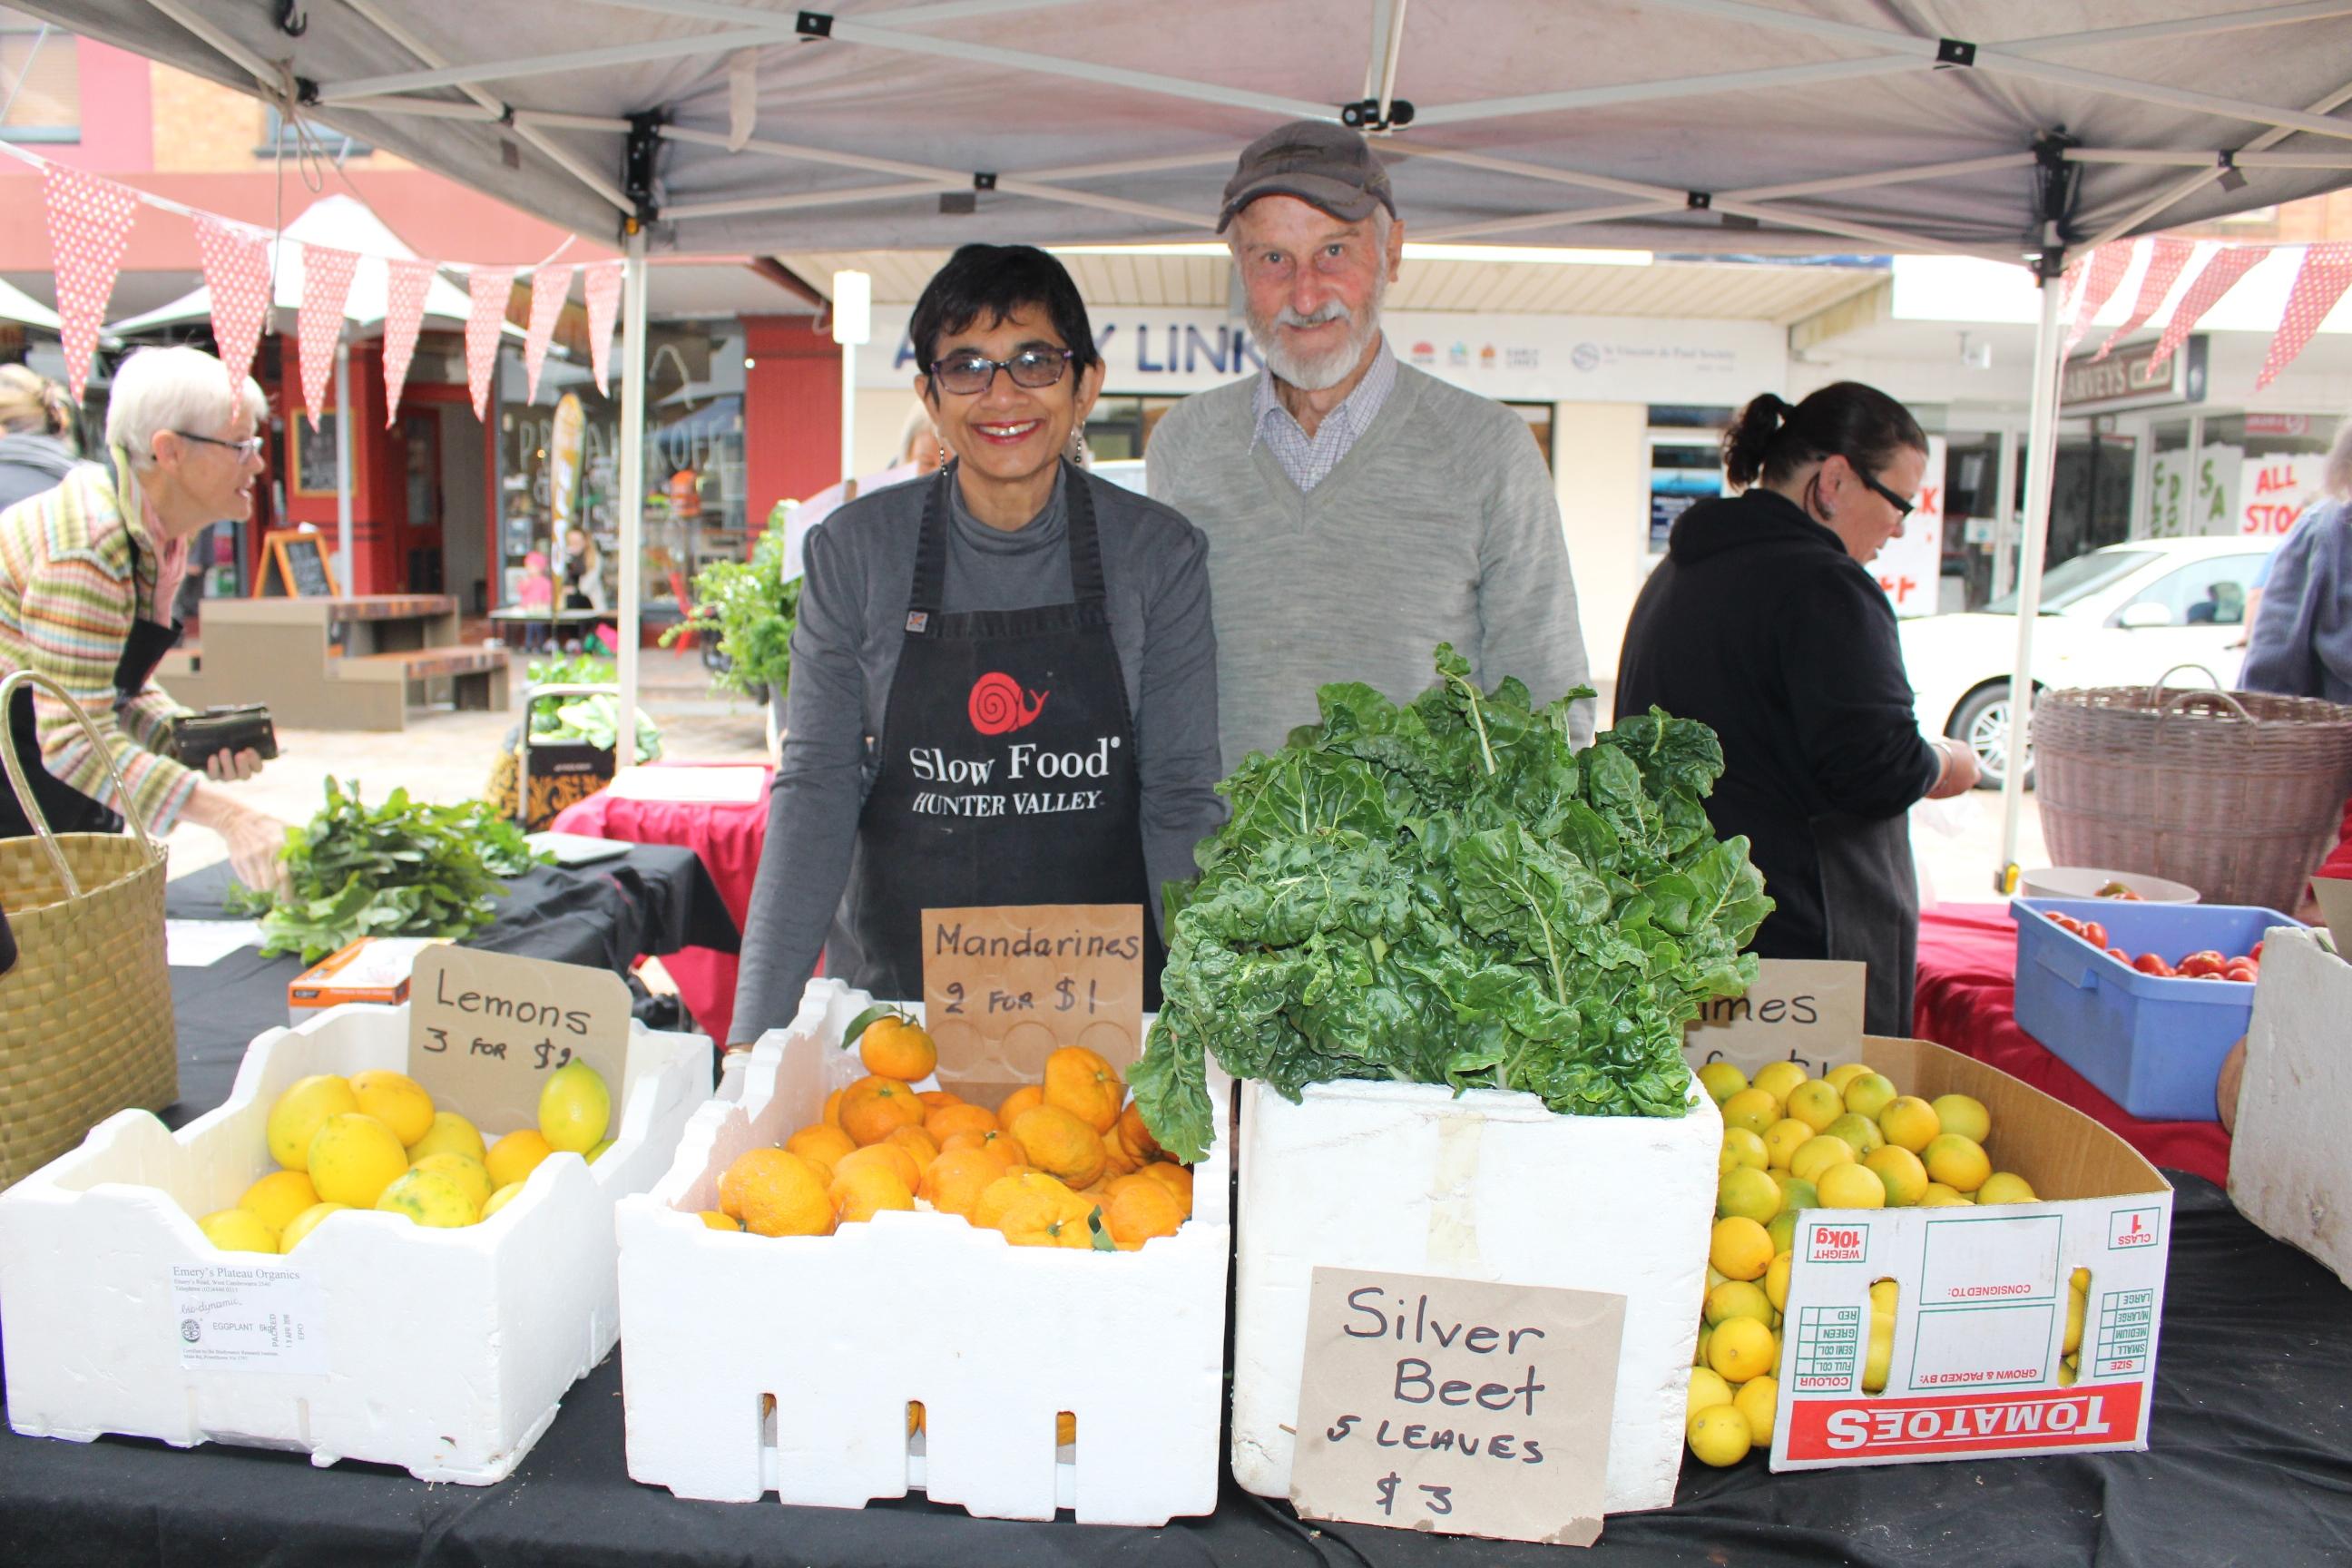 mercato_terra_australia_slow_food